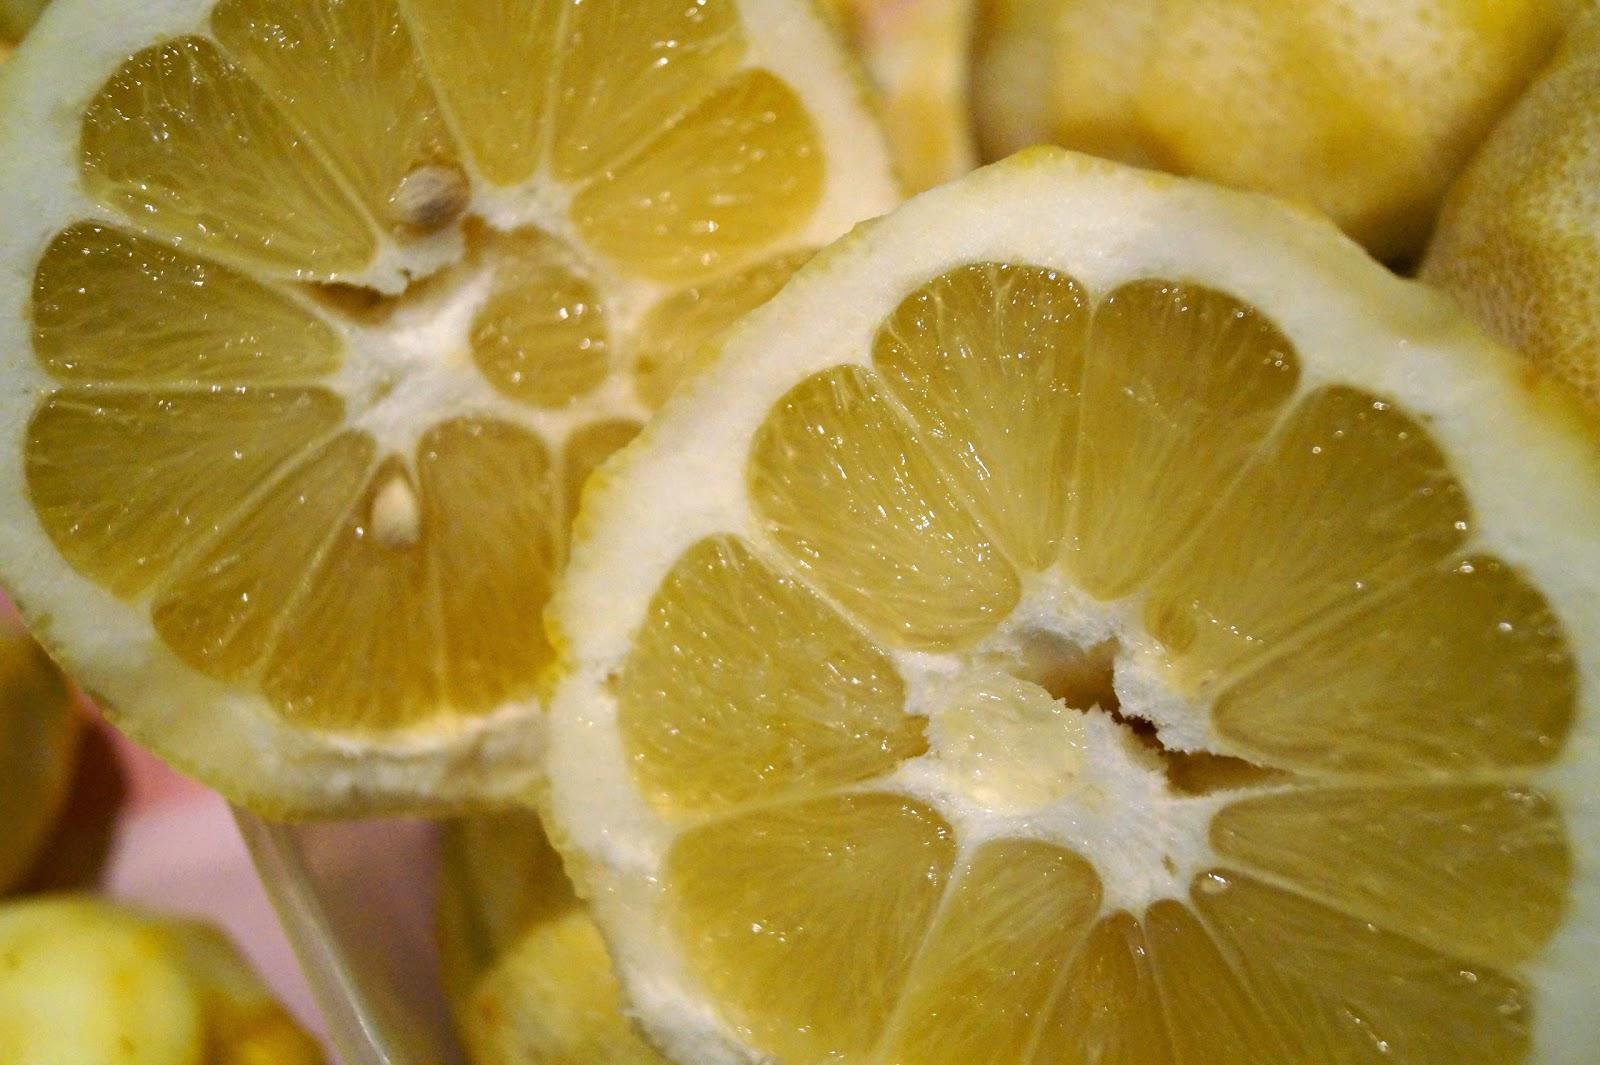 Limoni 1 2  3